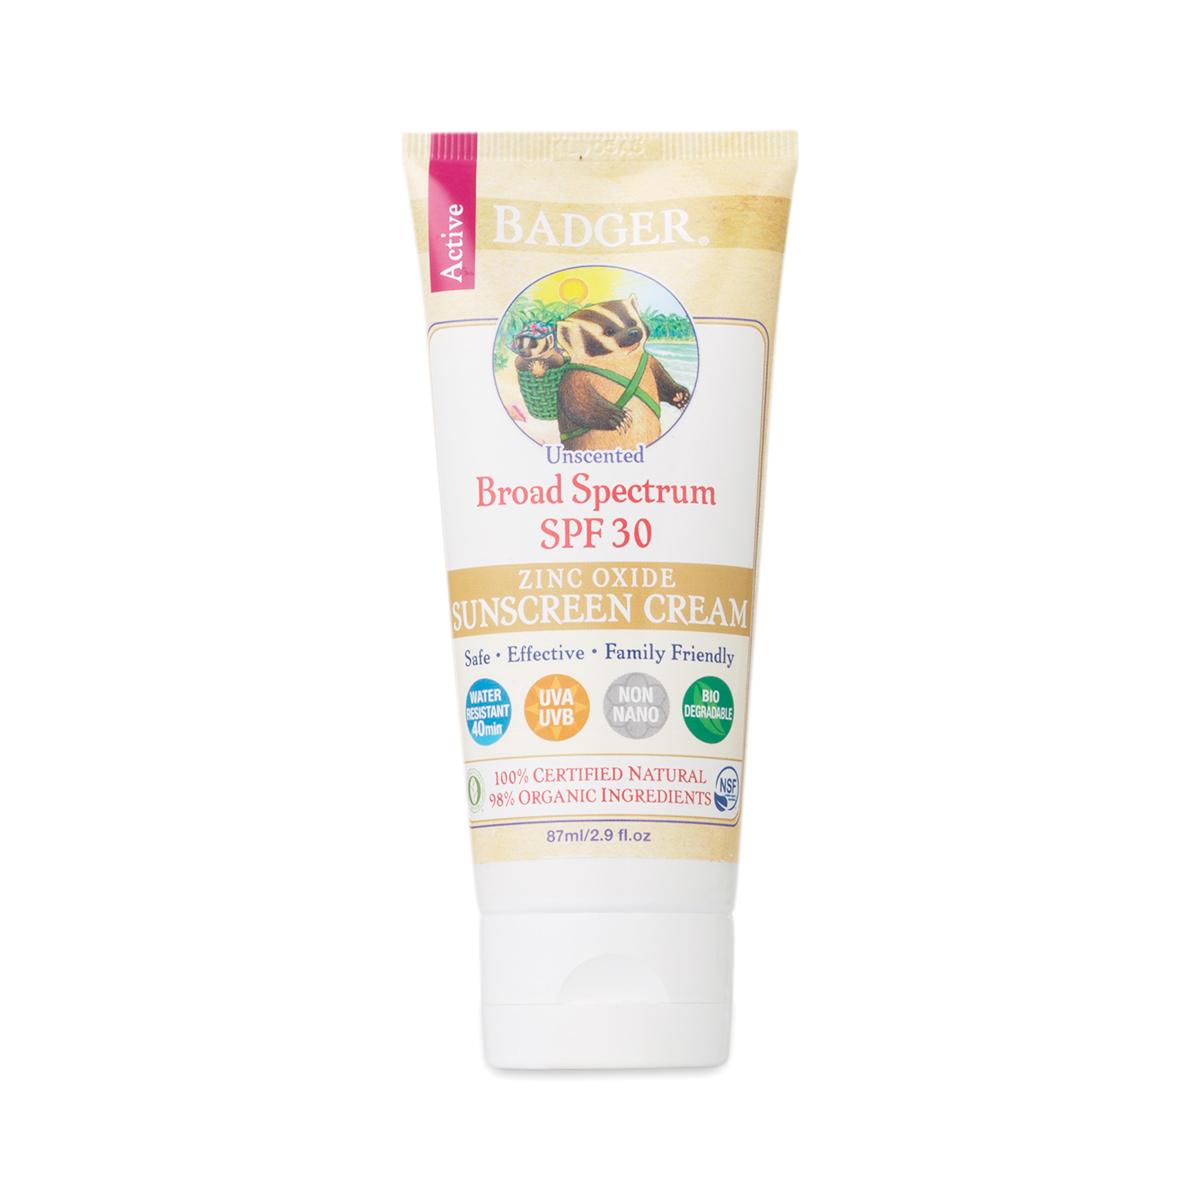 Badger Organic Zinc Oxide Sunscreen 2.9 fl. oz tube